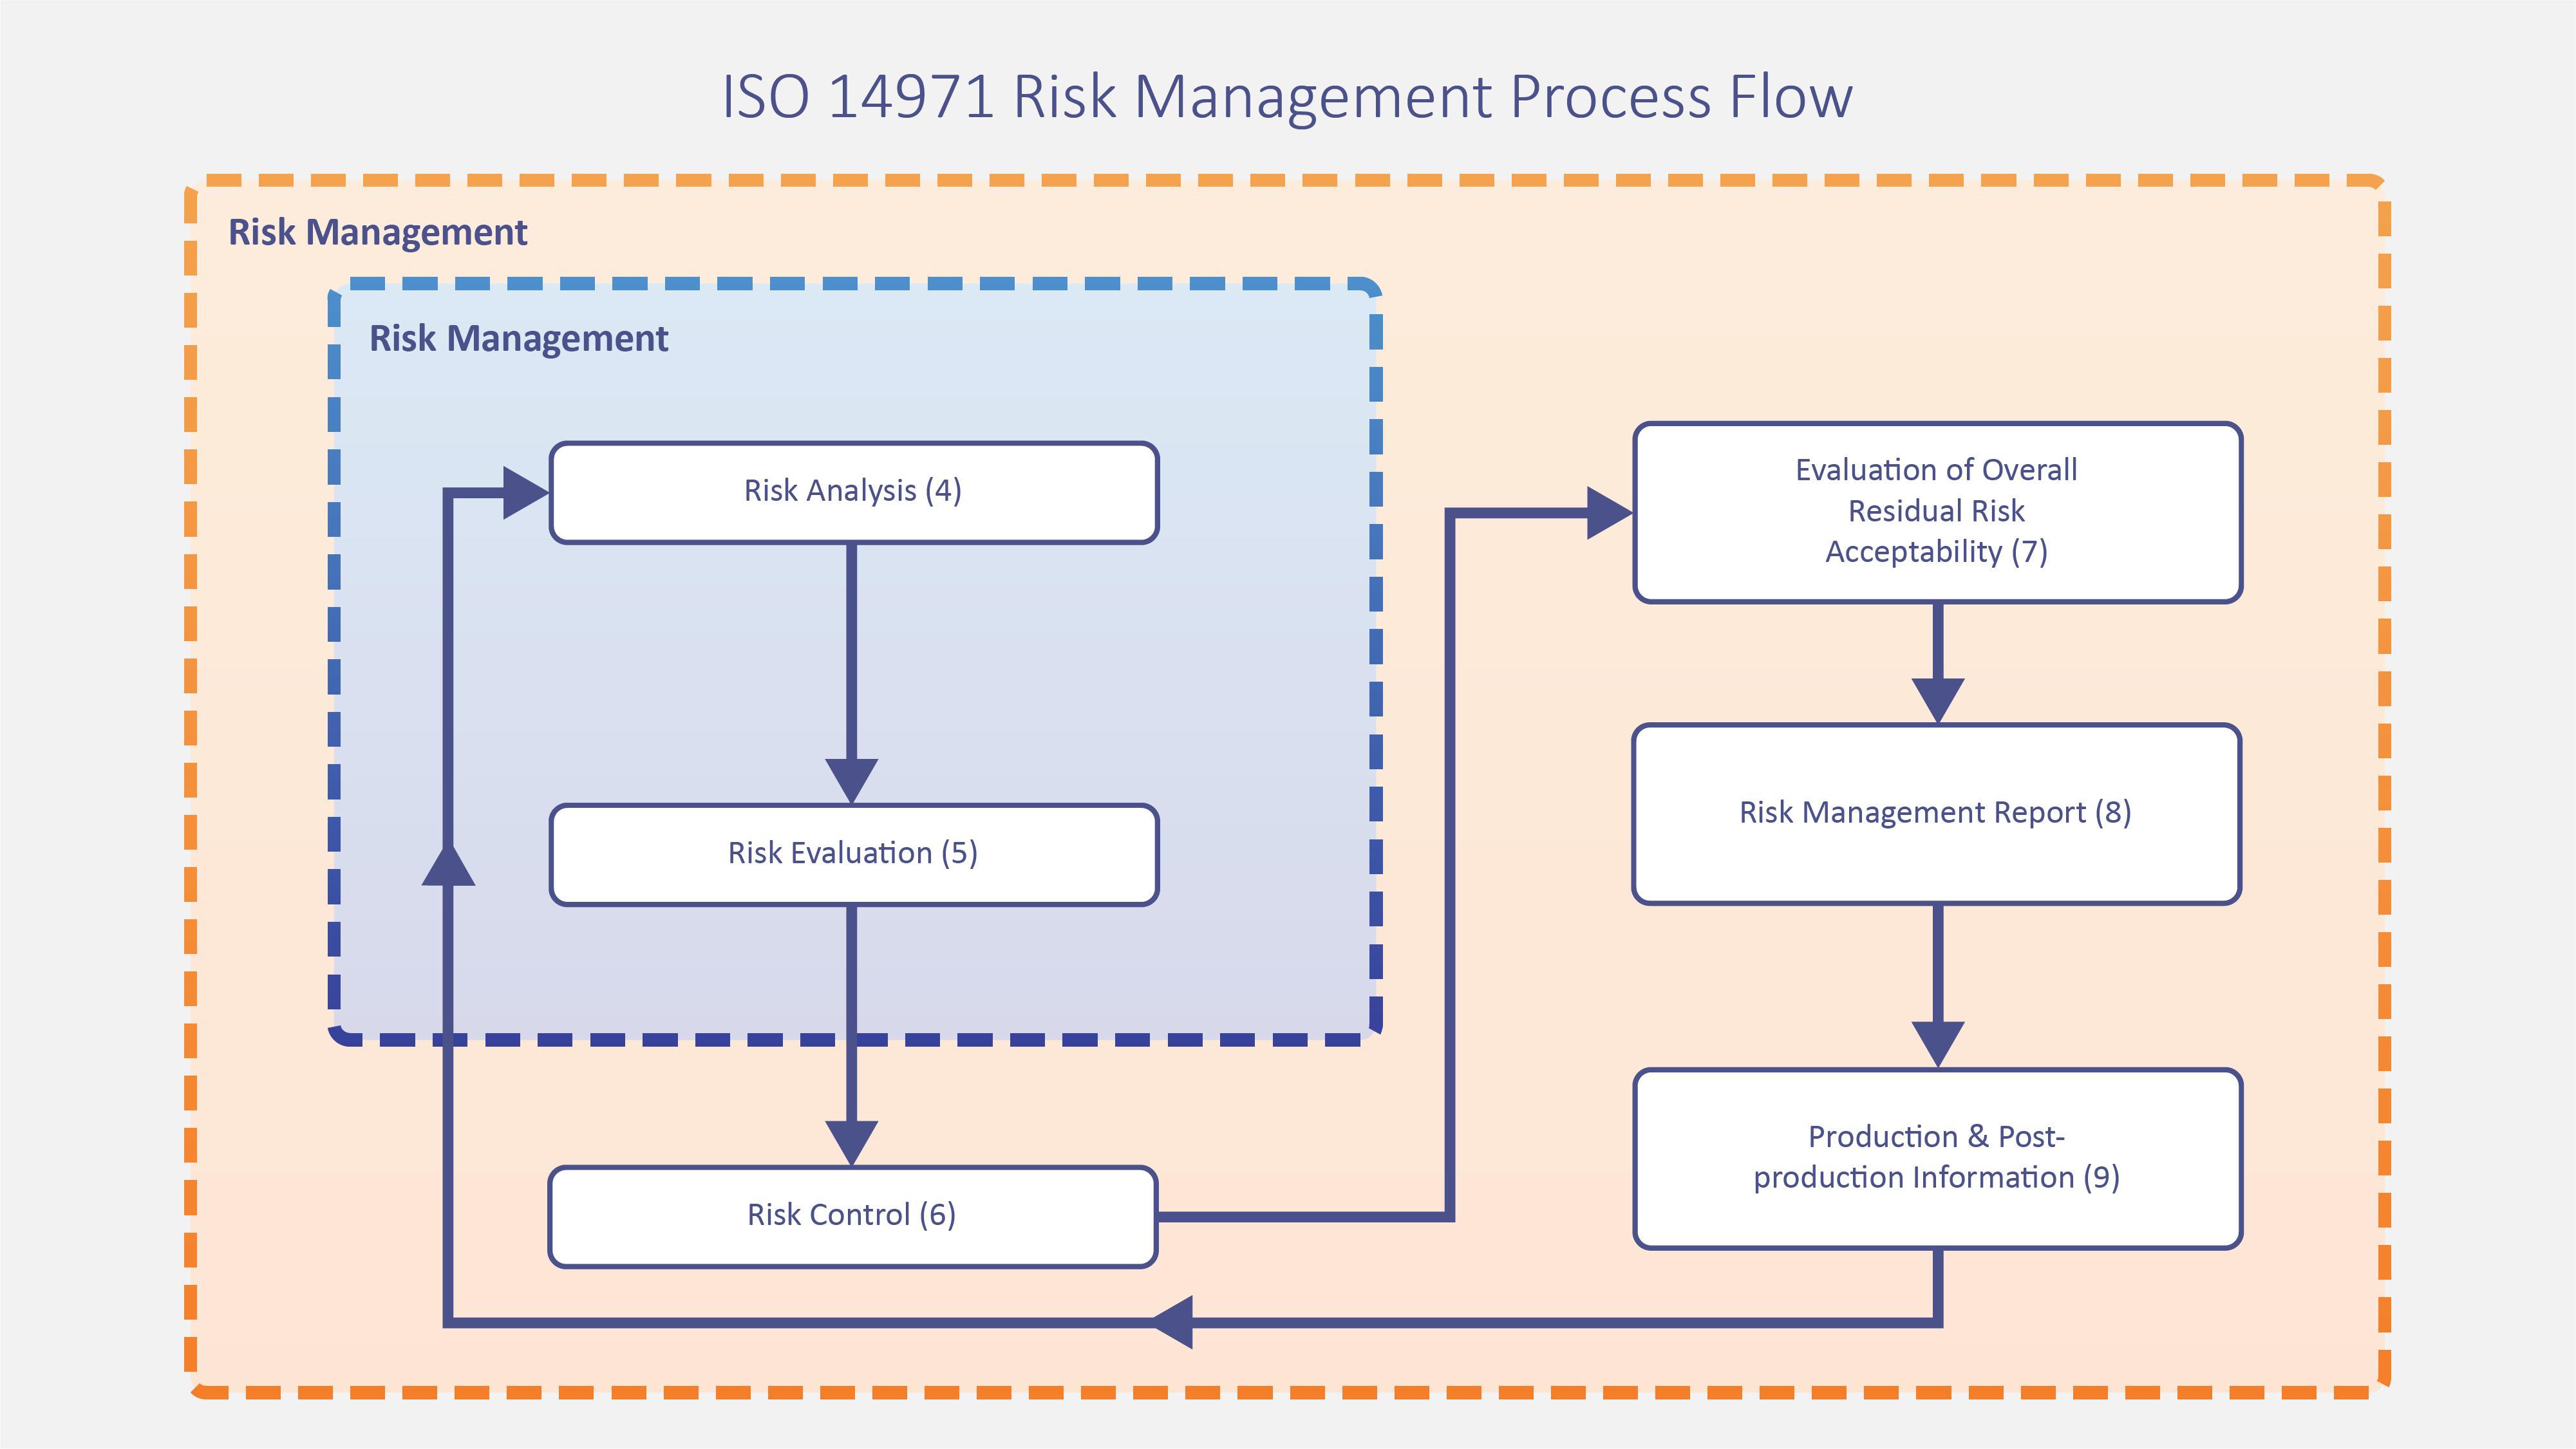 ISO 14971 Risk Management Process Flow